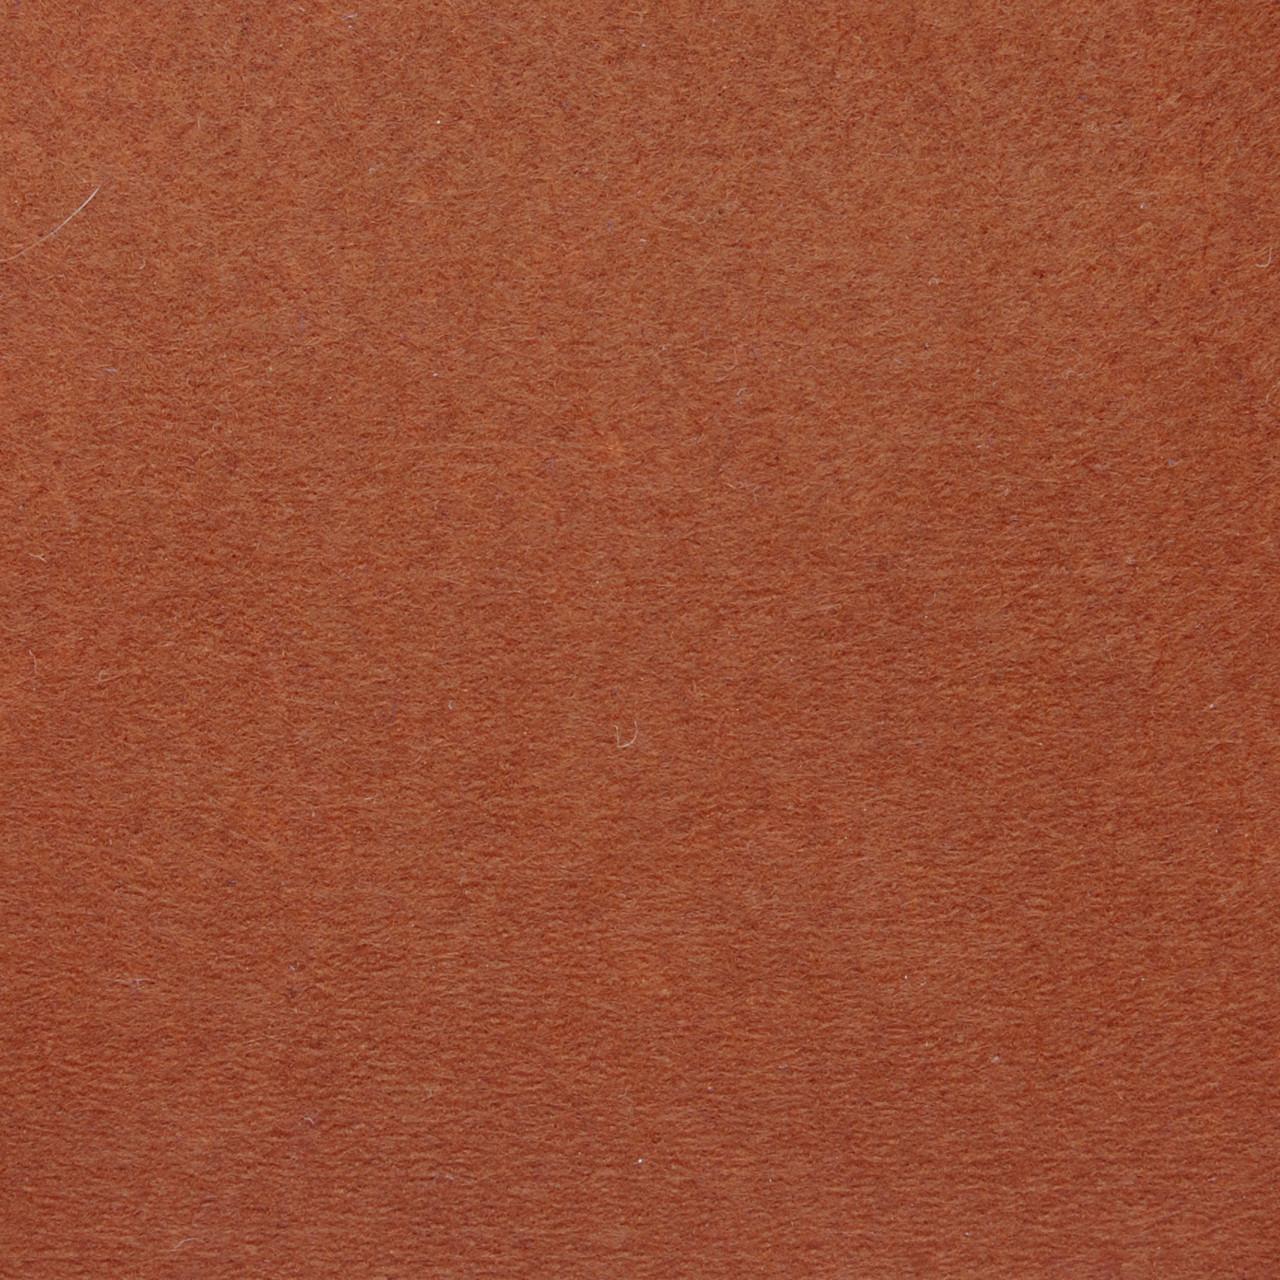 Фетр клеевой жесткий 1 мм, 20x30 см, КОРИЧНЕВЫЙ